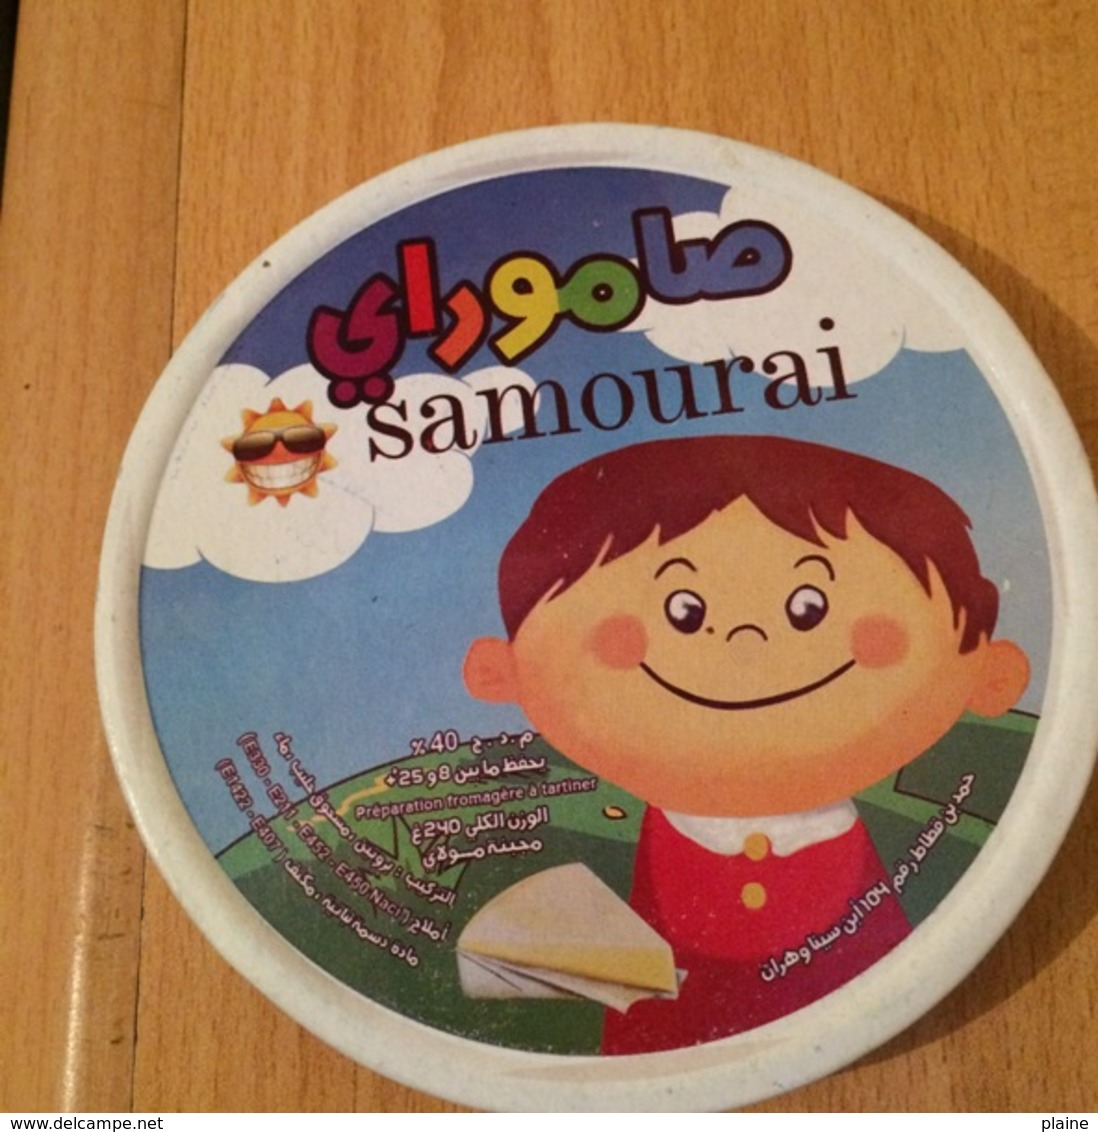 ETIQUETTE DE BOITE DE FROMAGE '' SAMOURAI'' - Cheese